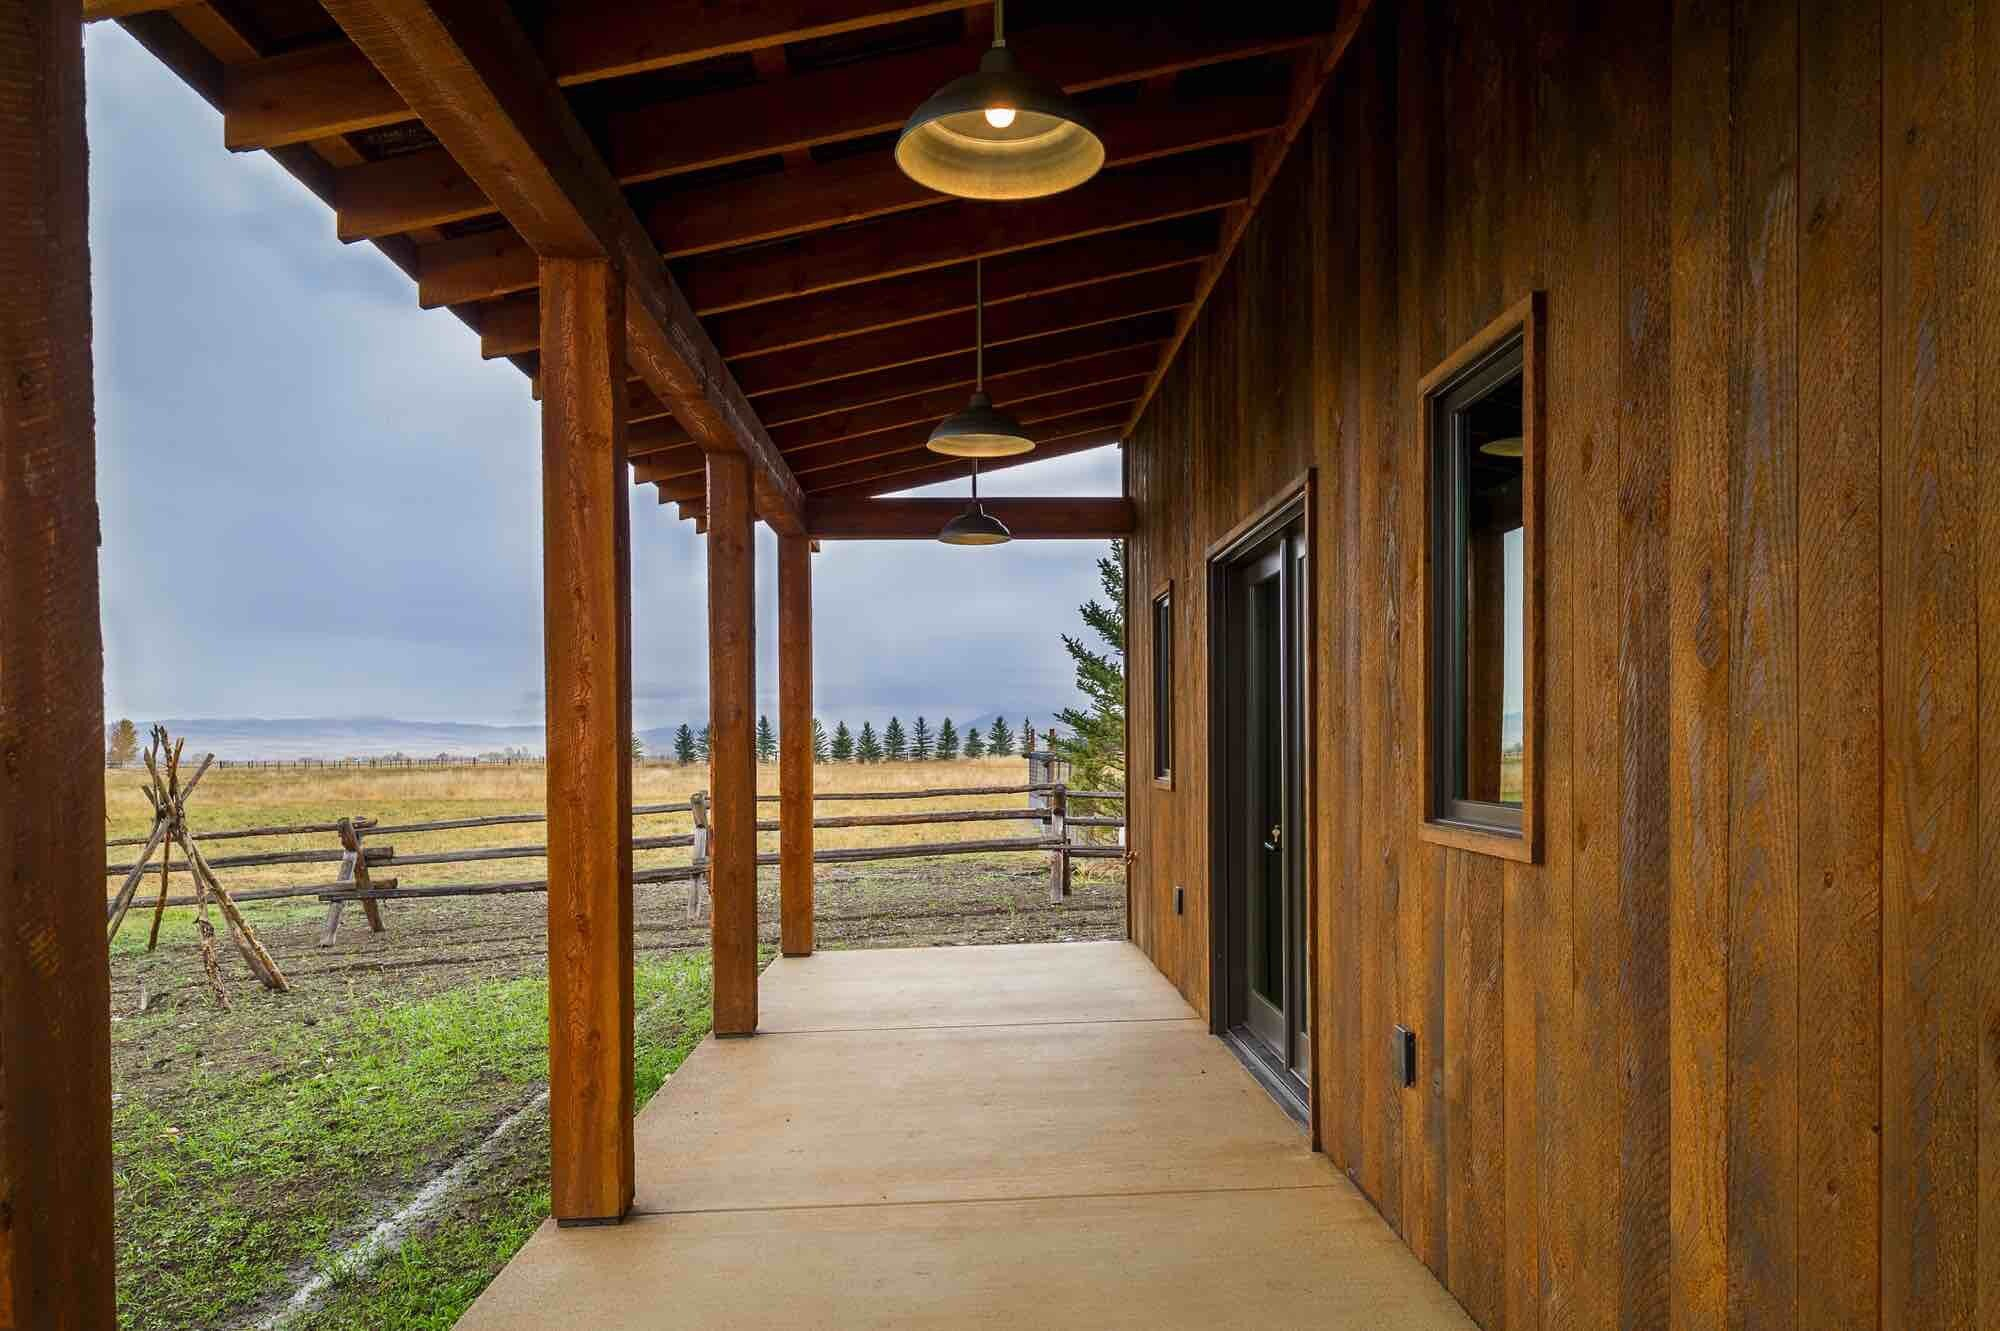 ranchwood Shiplap Siding and Doug Fir Timbers  Montana